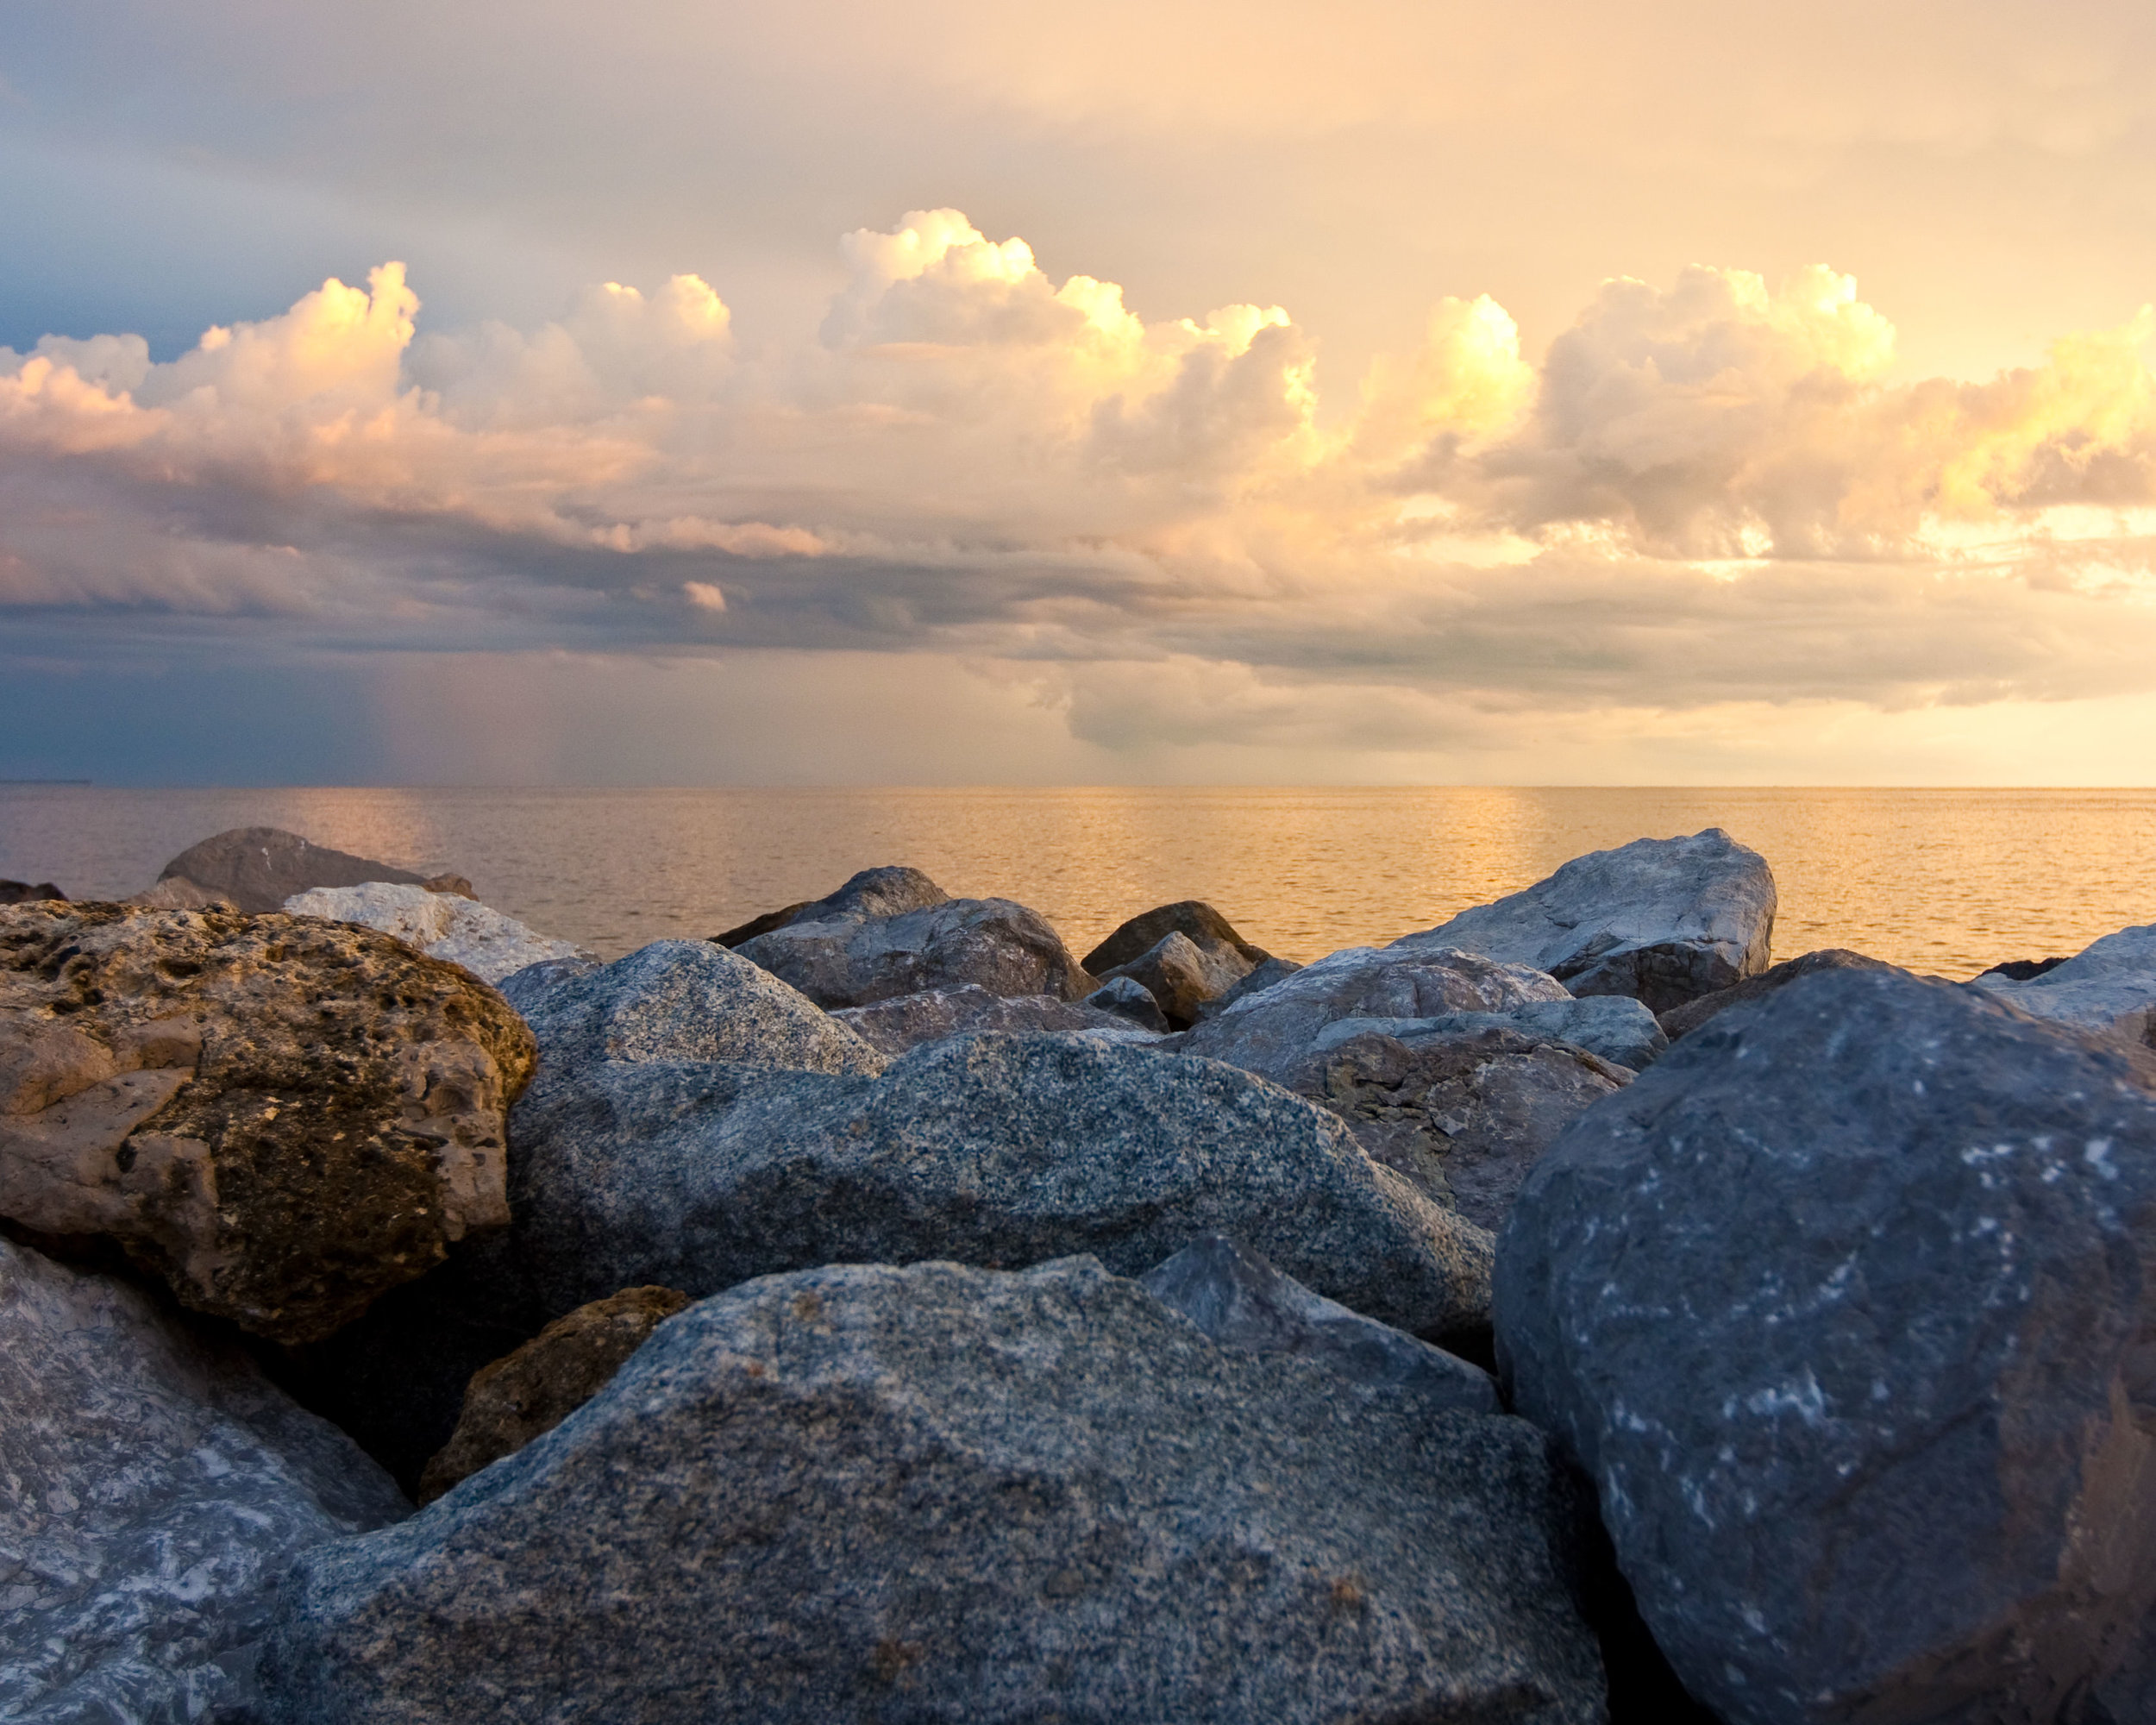 rocks_water_clouds-8713-smugmug.jpg